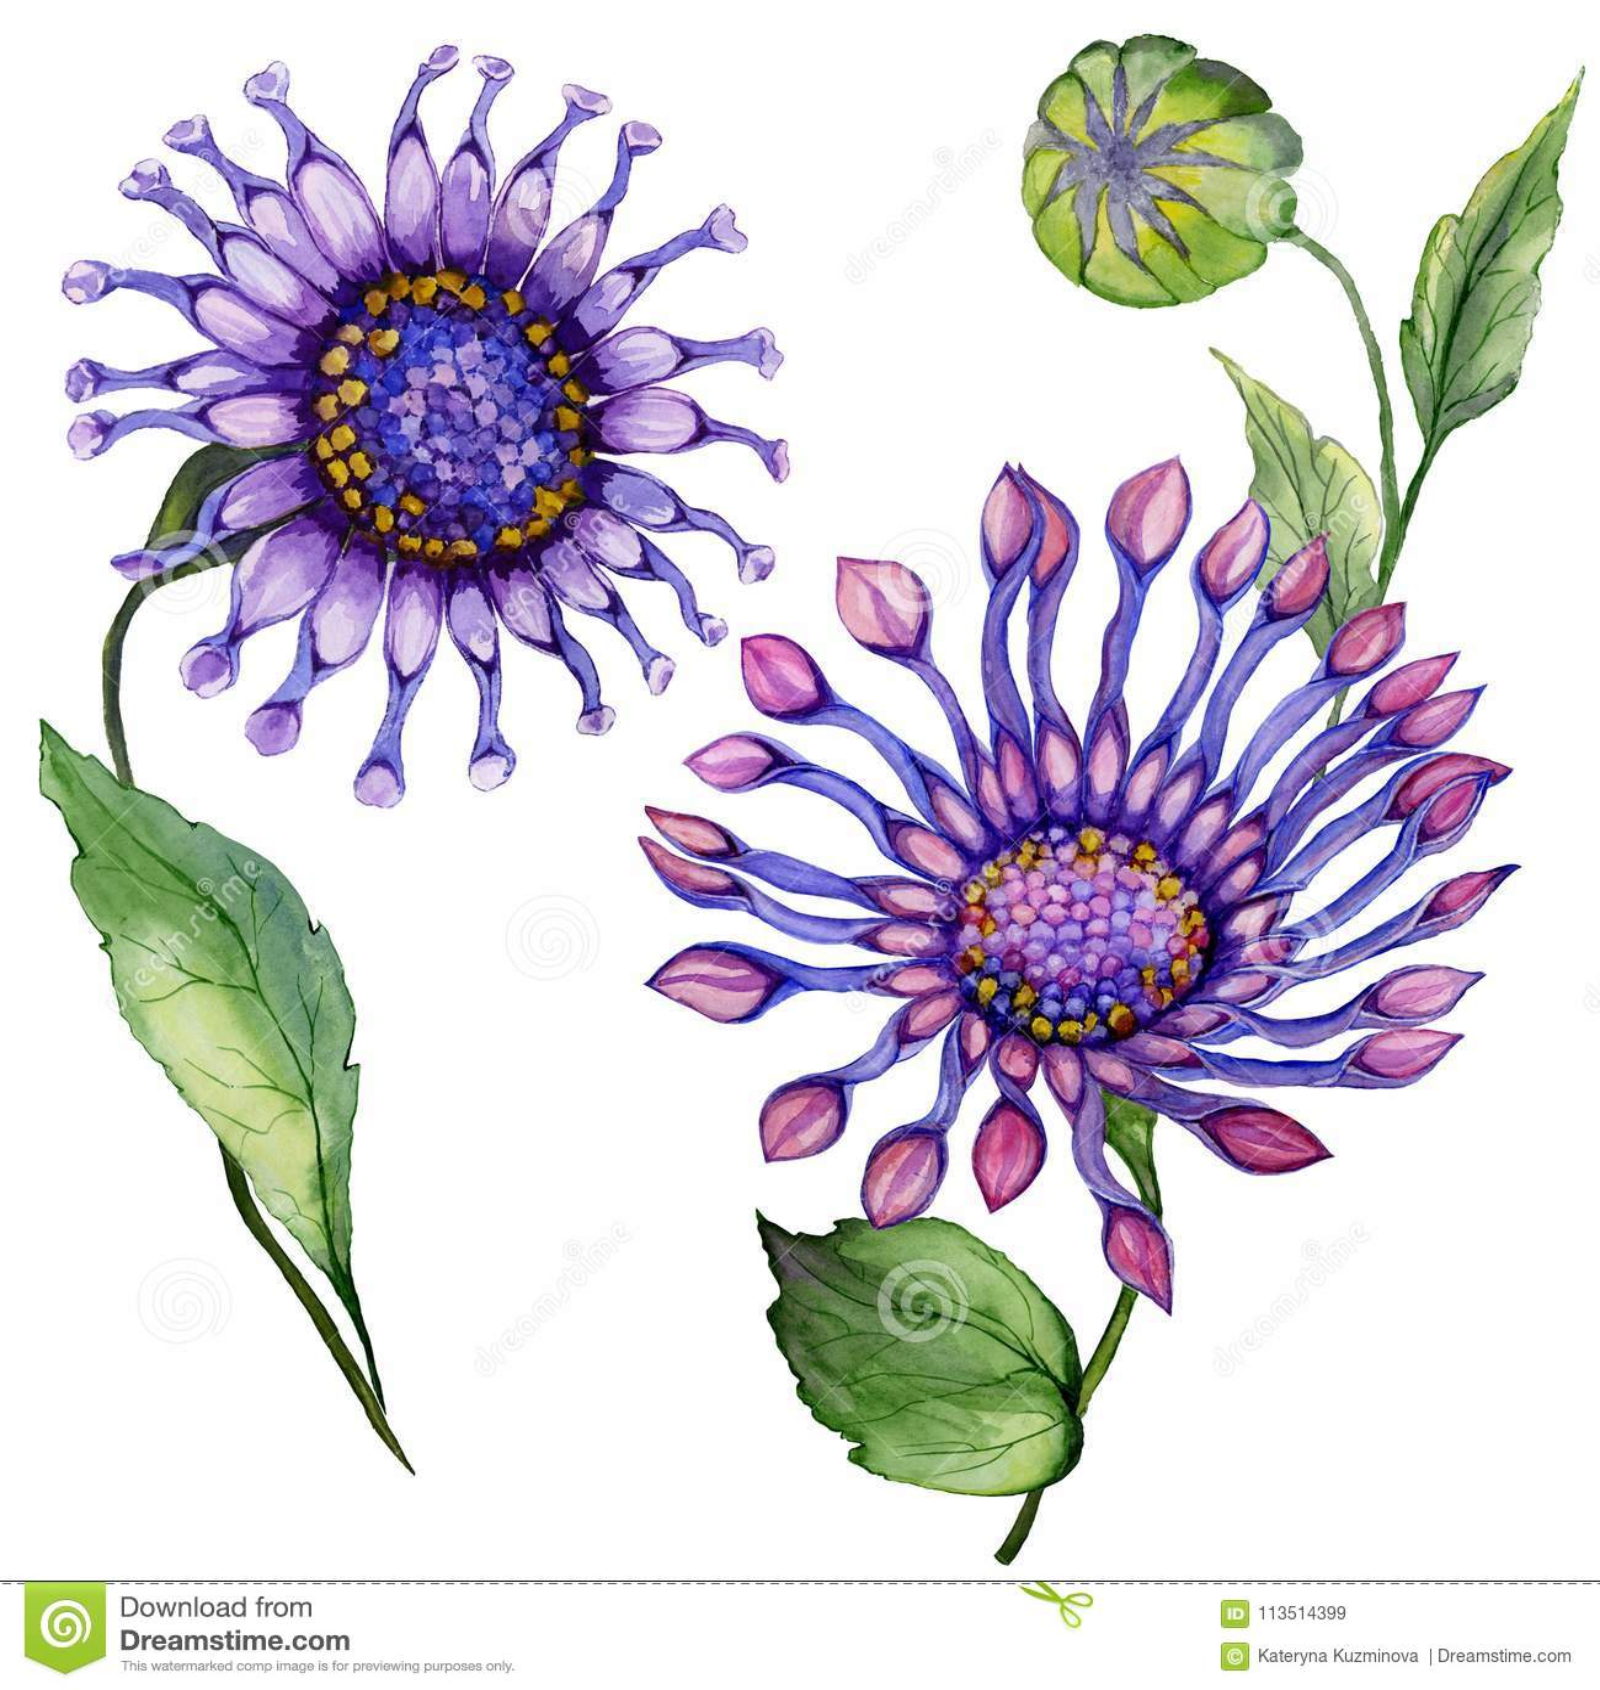 Beautiful Purple Osteospermum South African Daisy Flower On A Stem